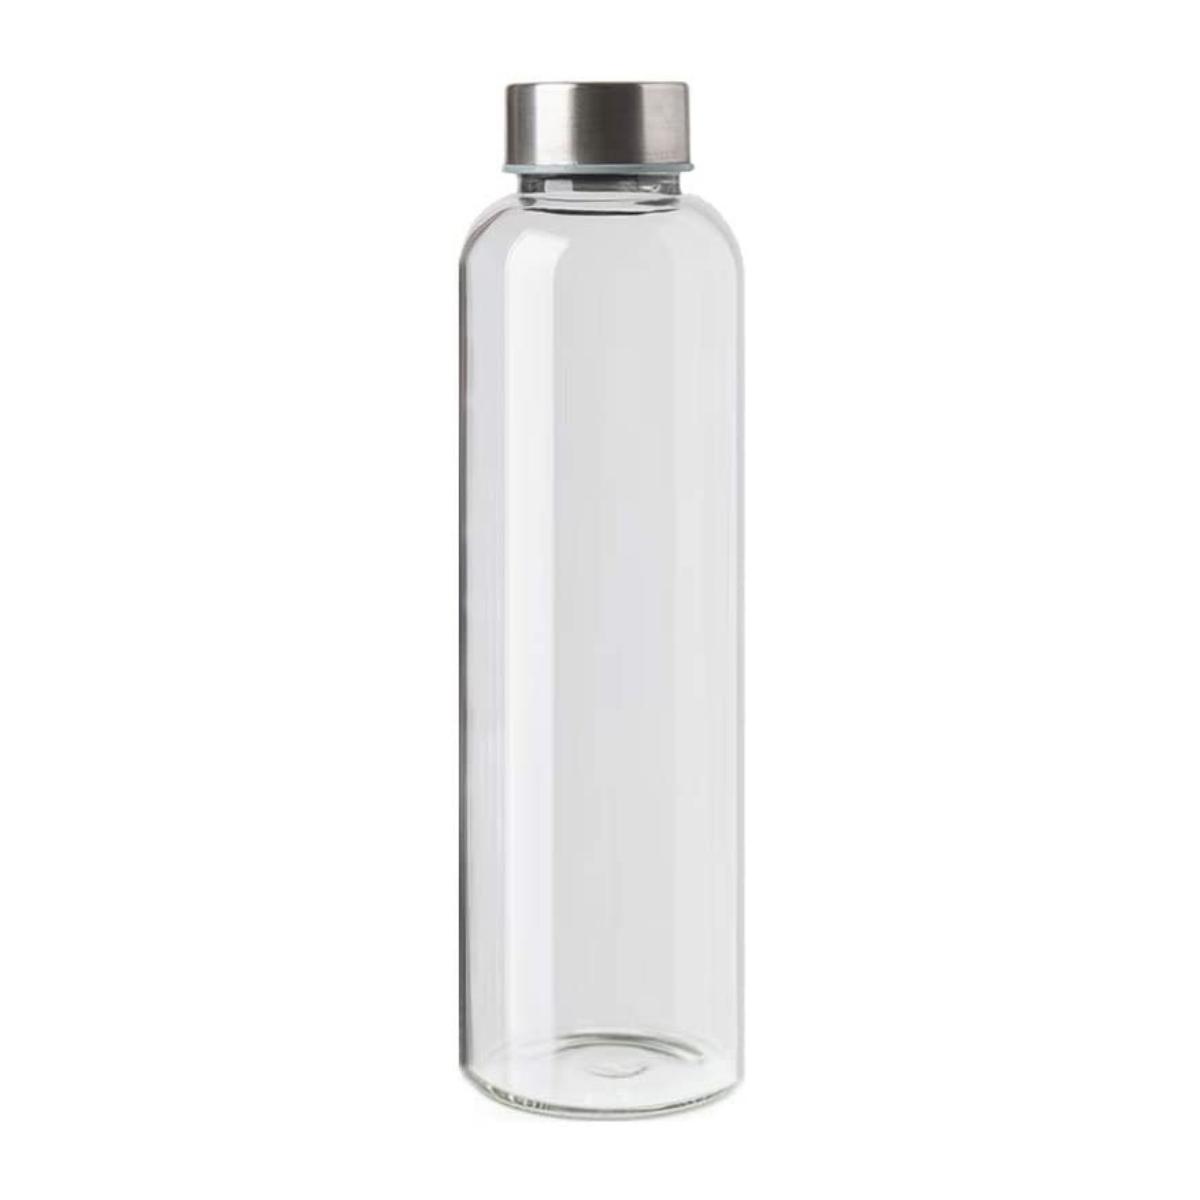 Garrafa Perfect Water Rosa 500ml - Pacco  - KFit Nutrition